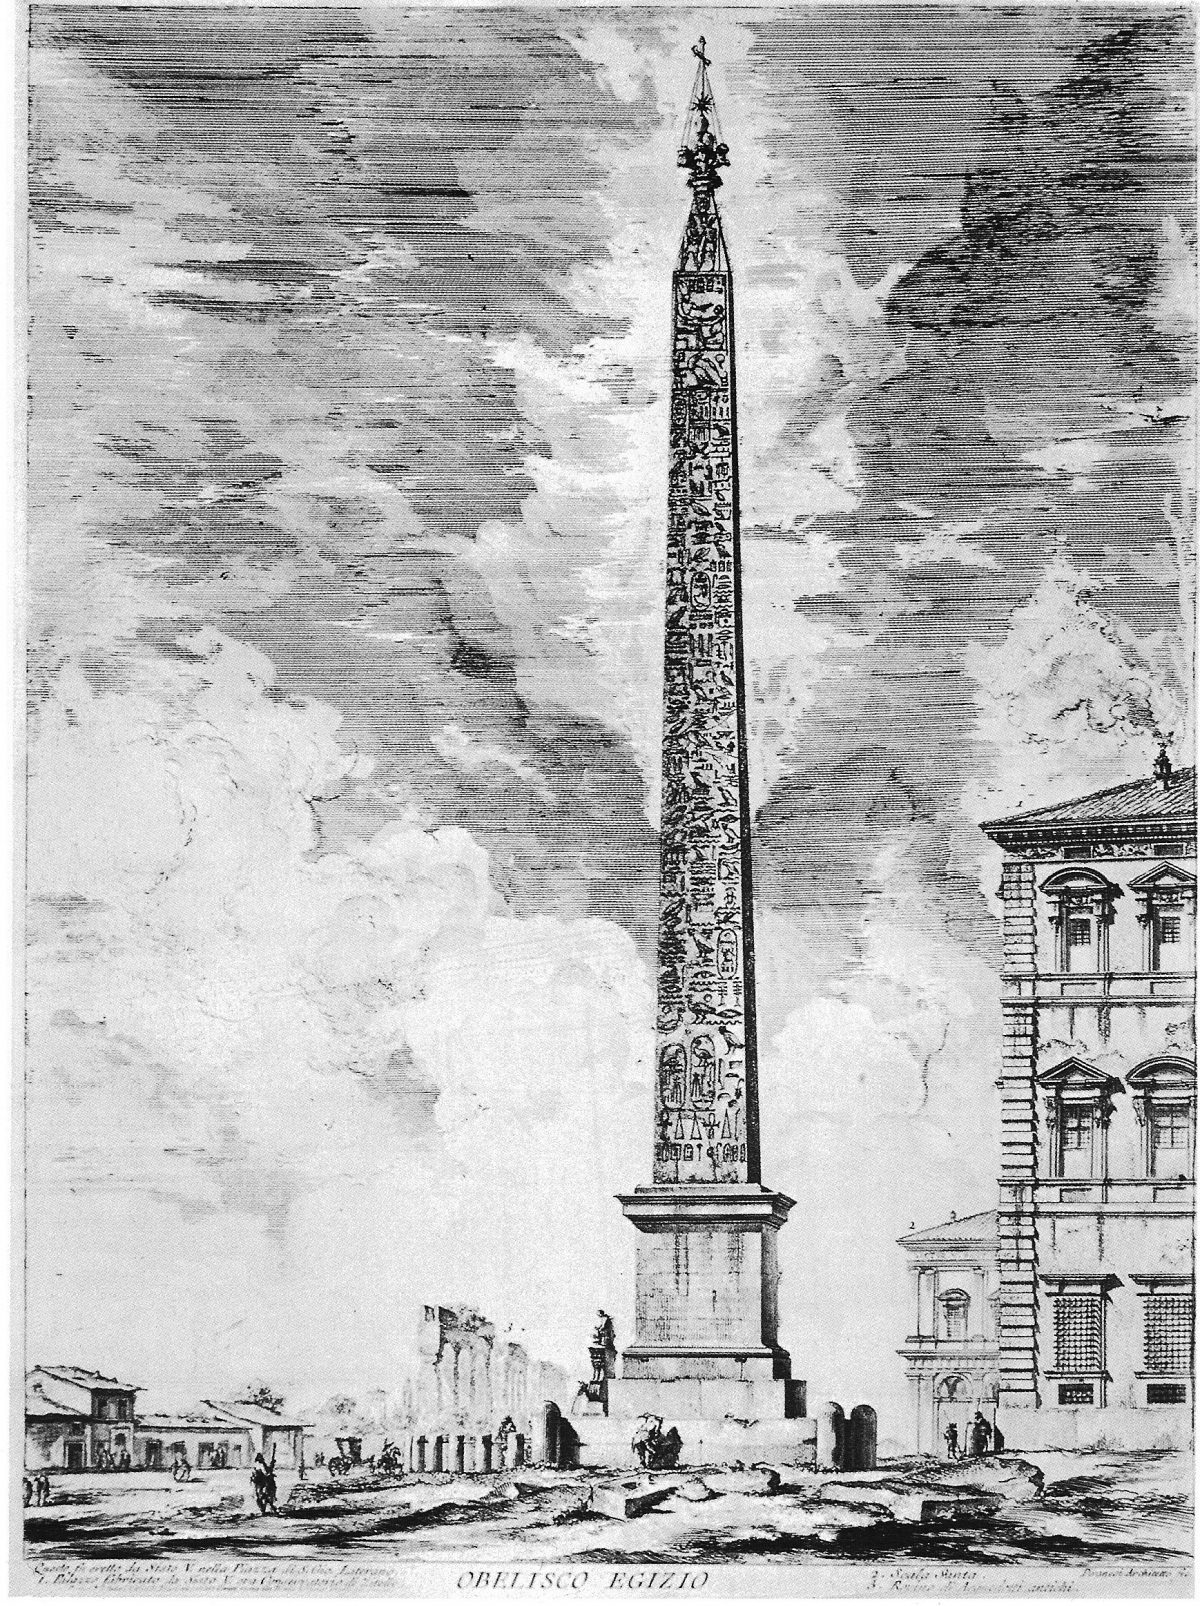 Engravings by Piranesi - piranesi029